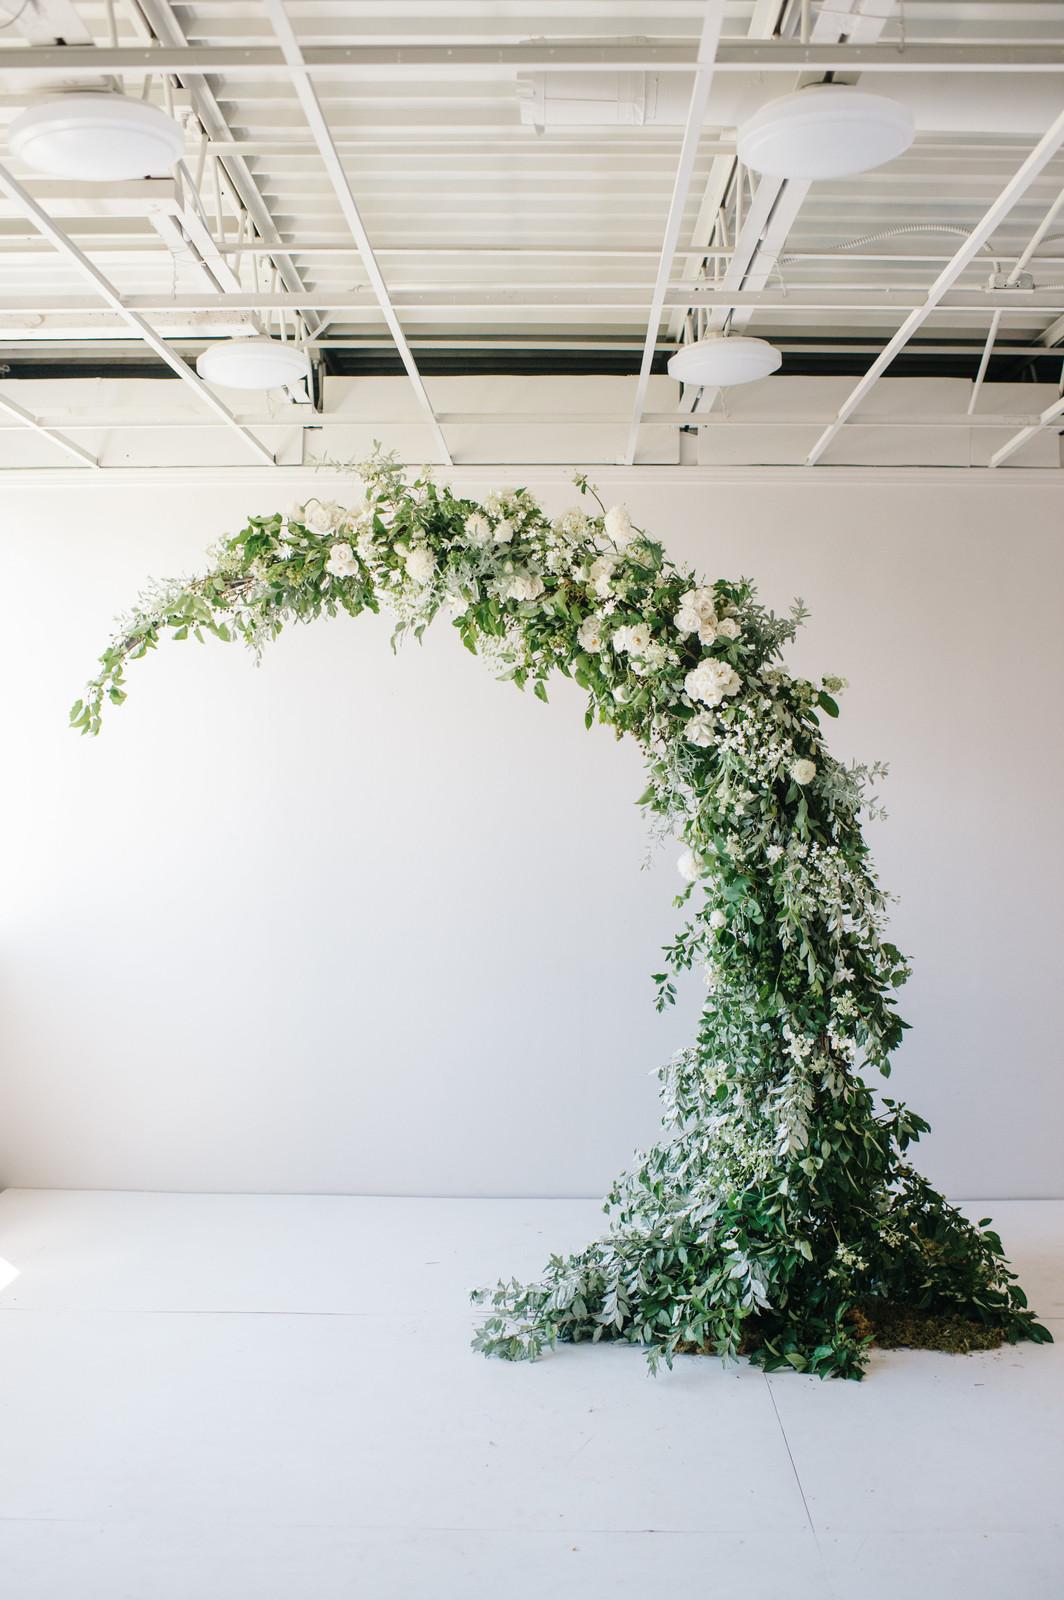 midland mi florist allora floral design portfolio